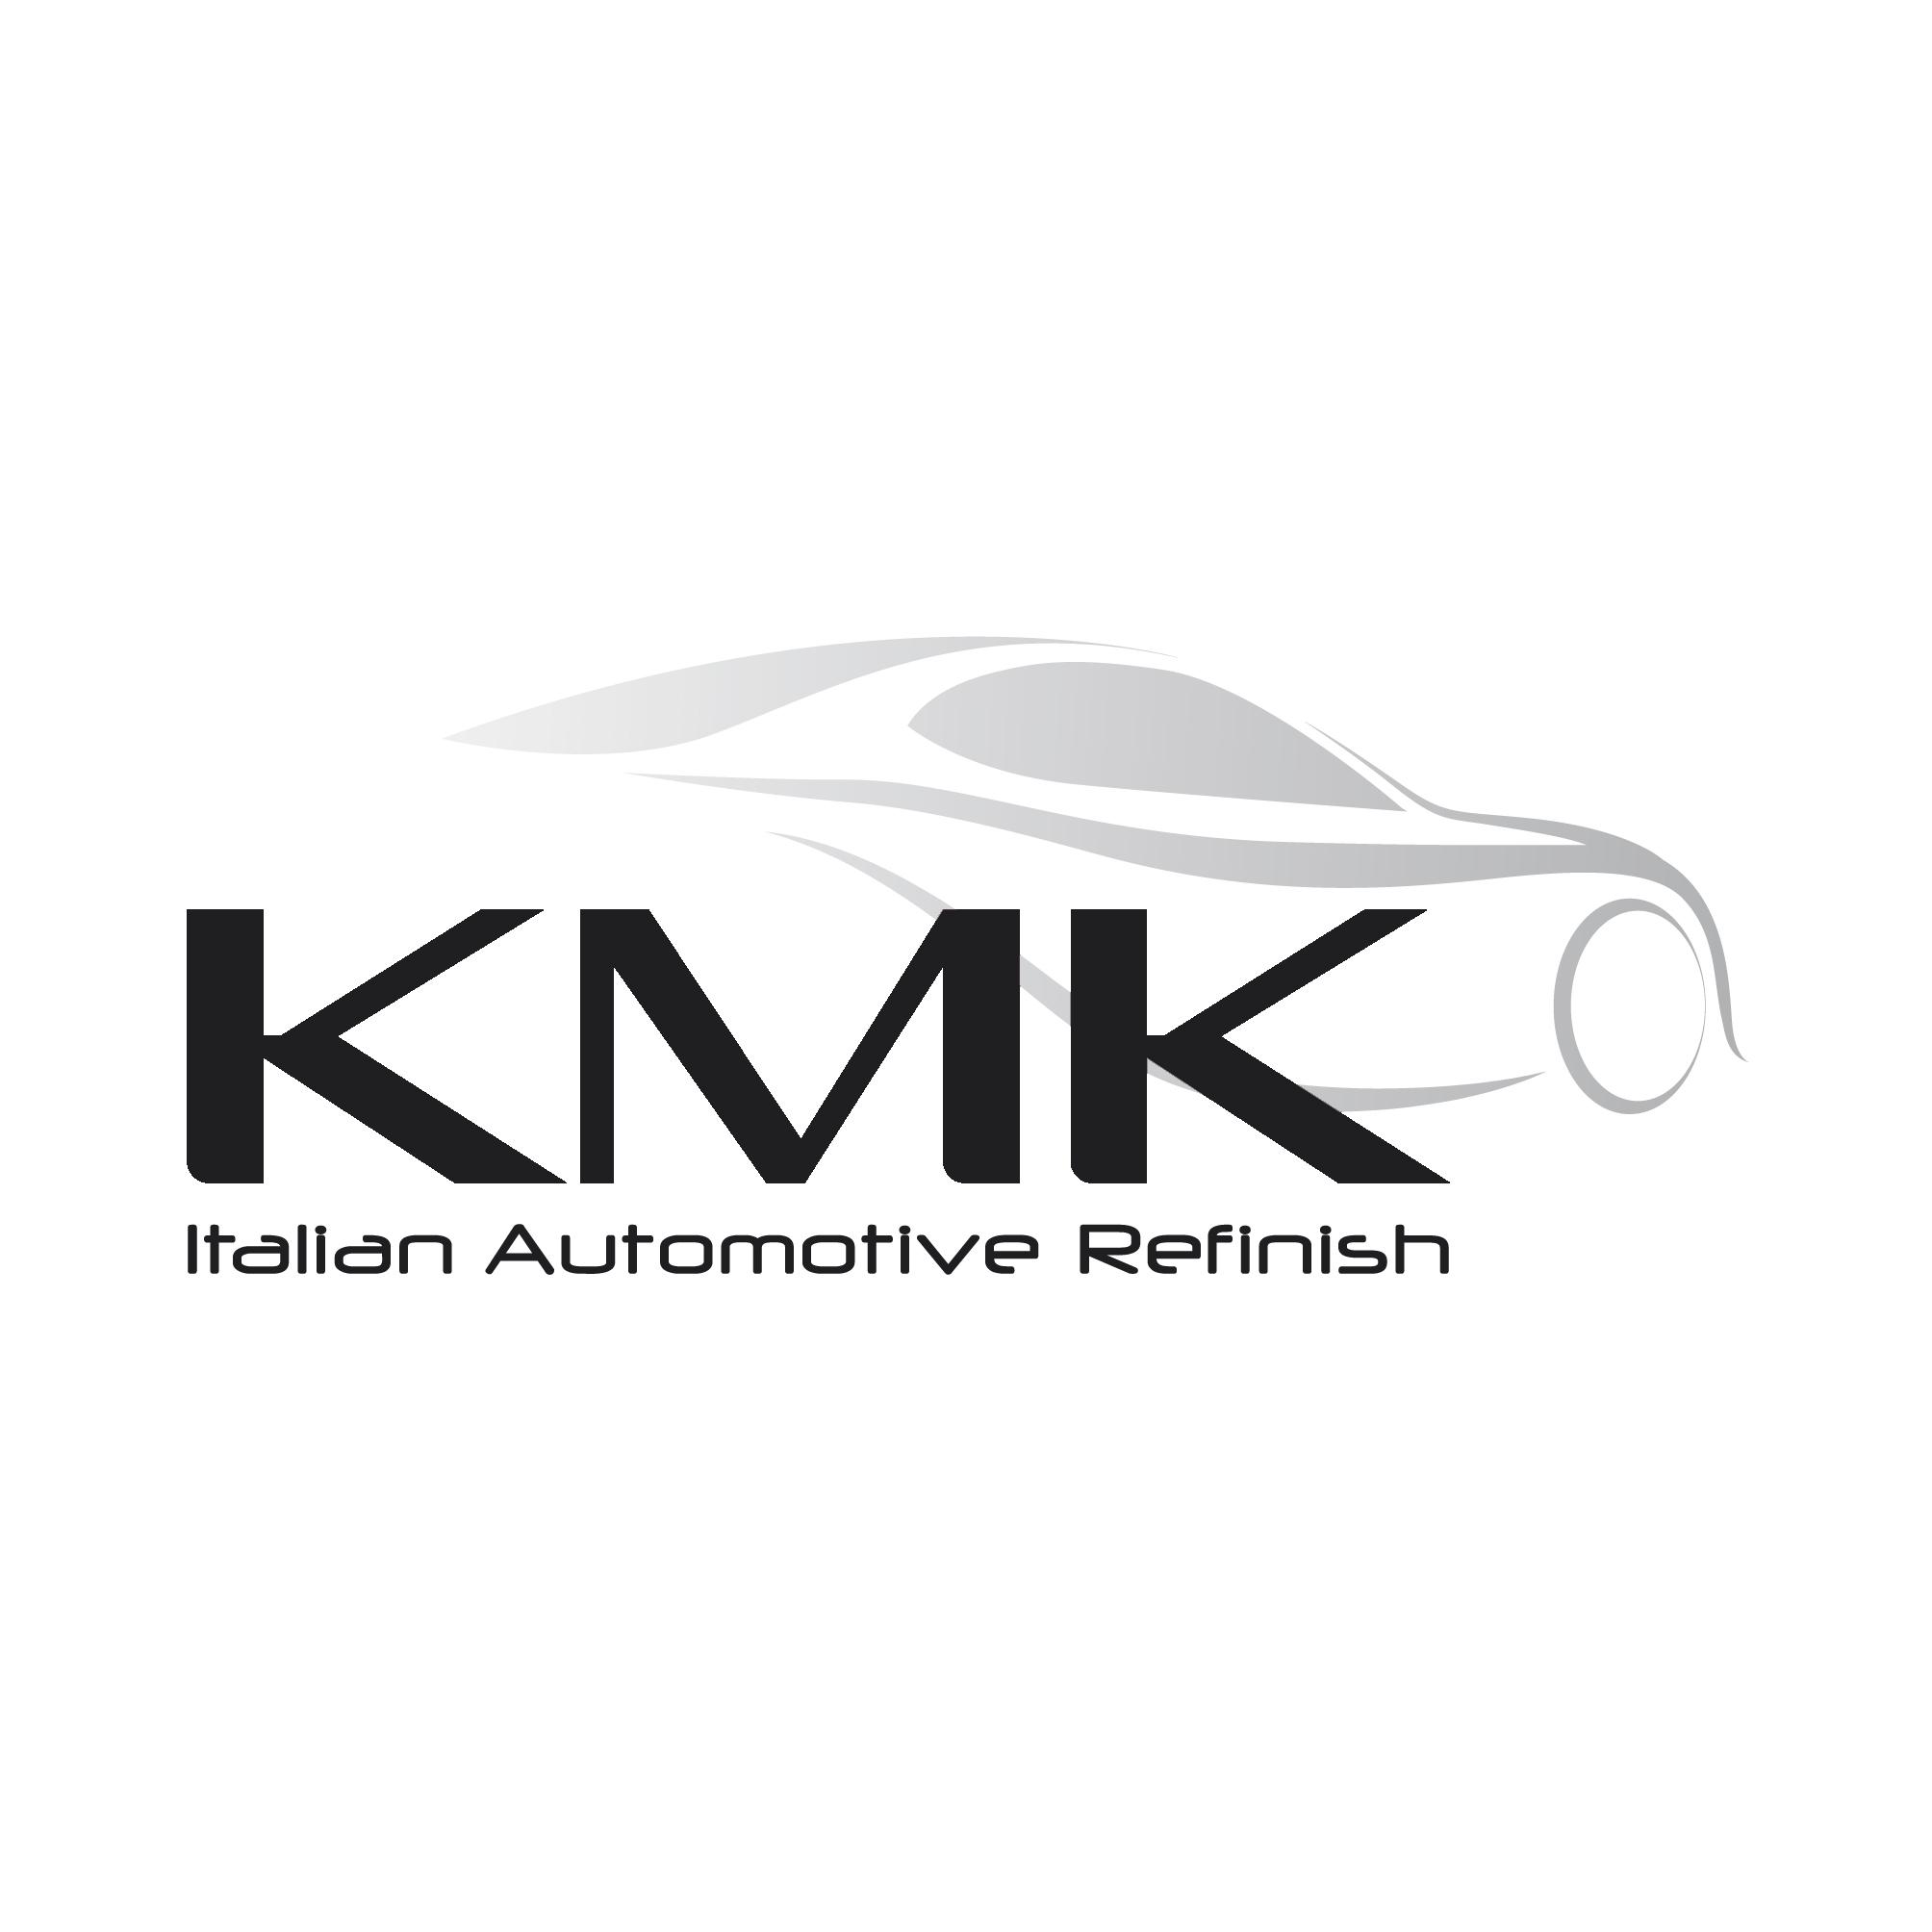 KMK Italian Automotive Refinish